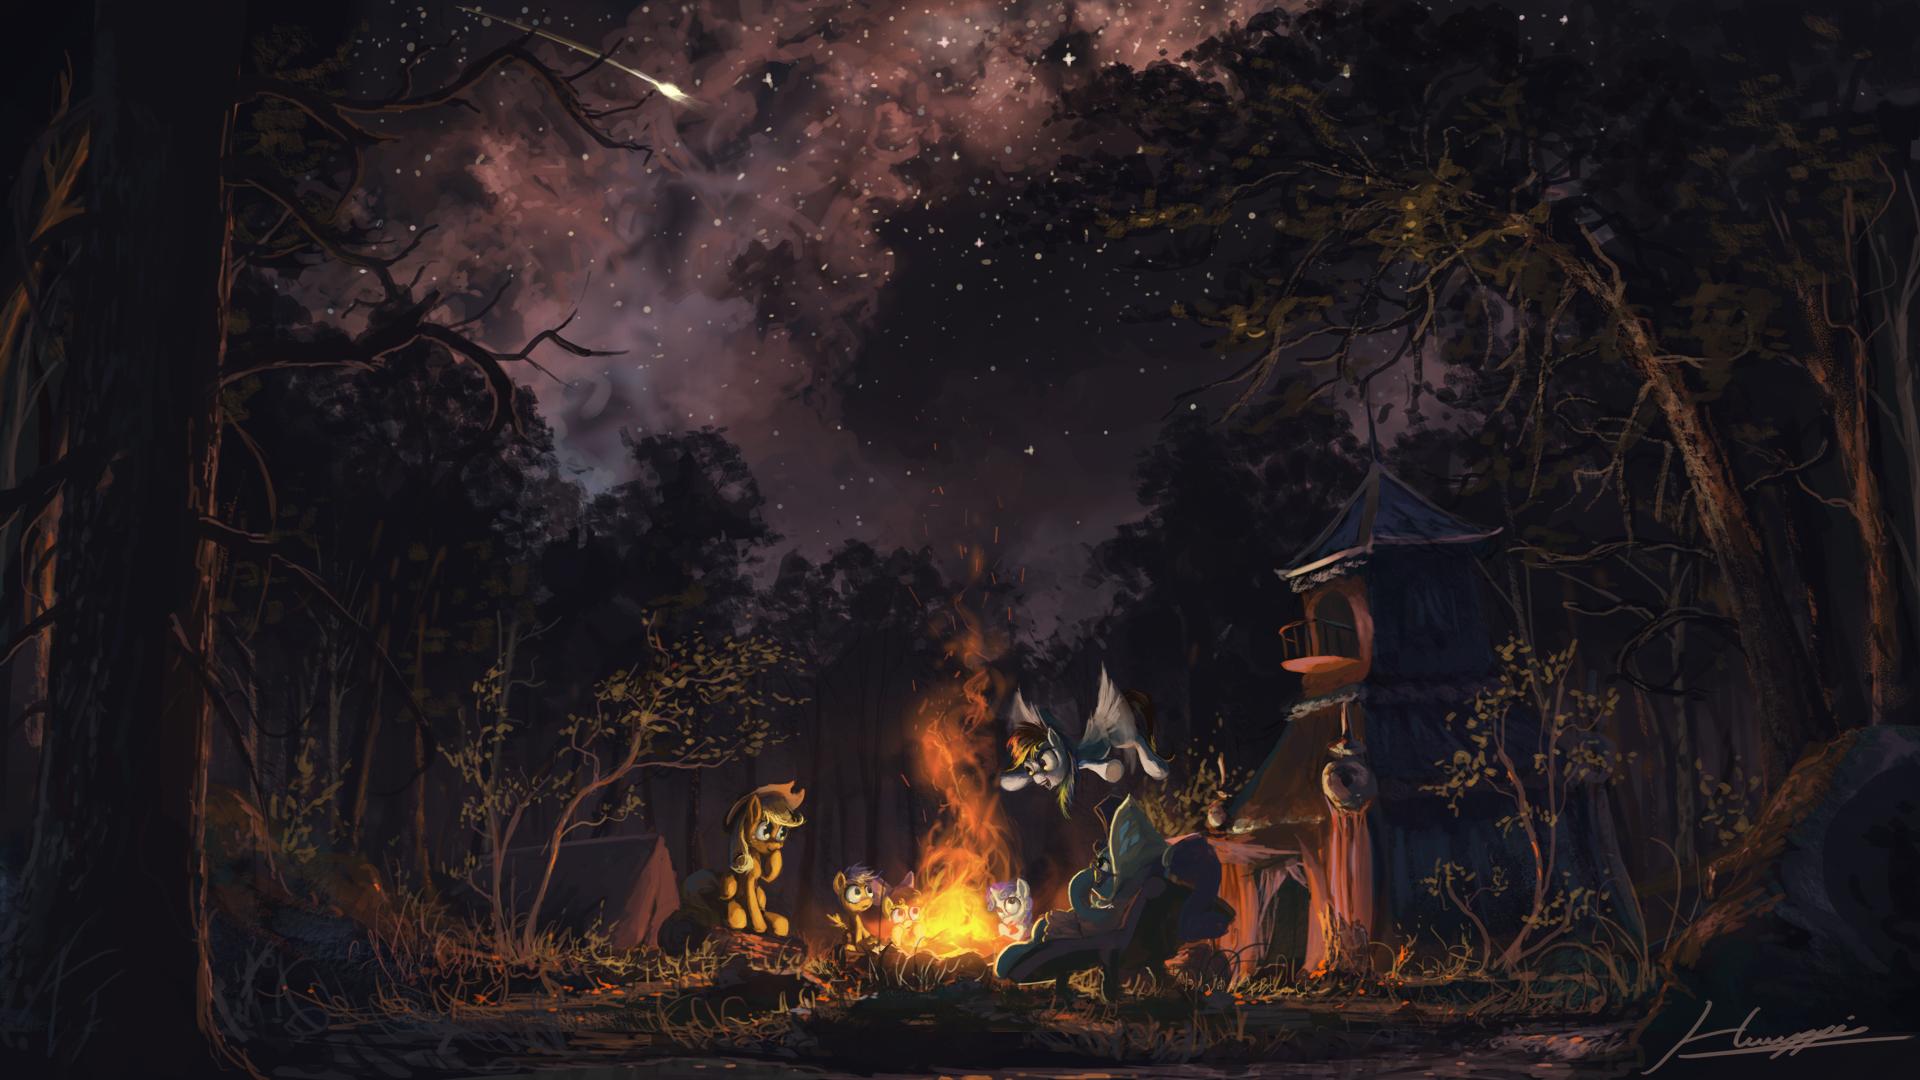 Sleepless In Ponyville HD Wallpaper